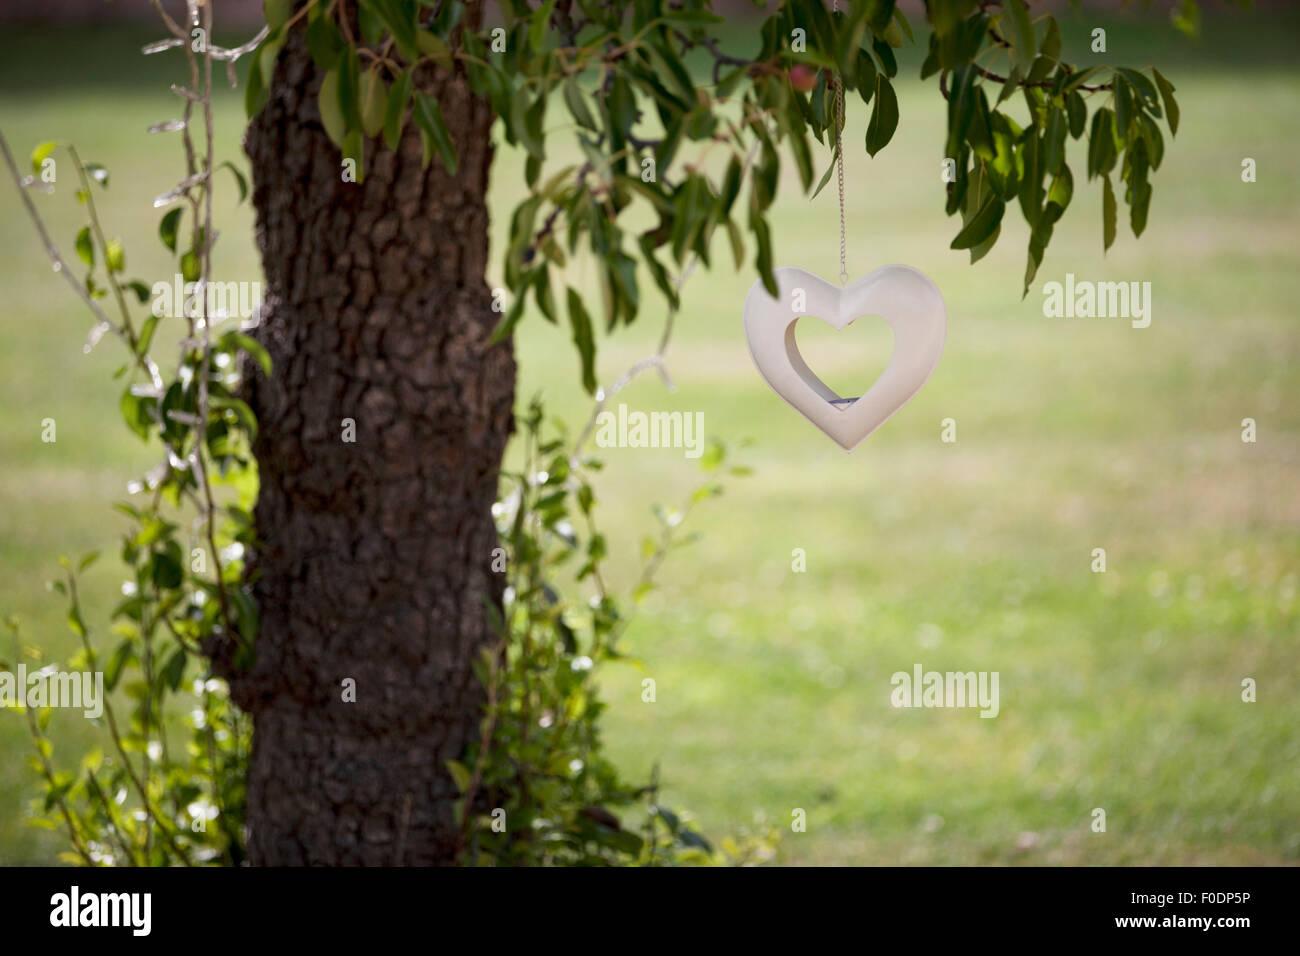 Heart Candle Holder Stockfotos & Heart Candle Holder Bilder - Alamy